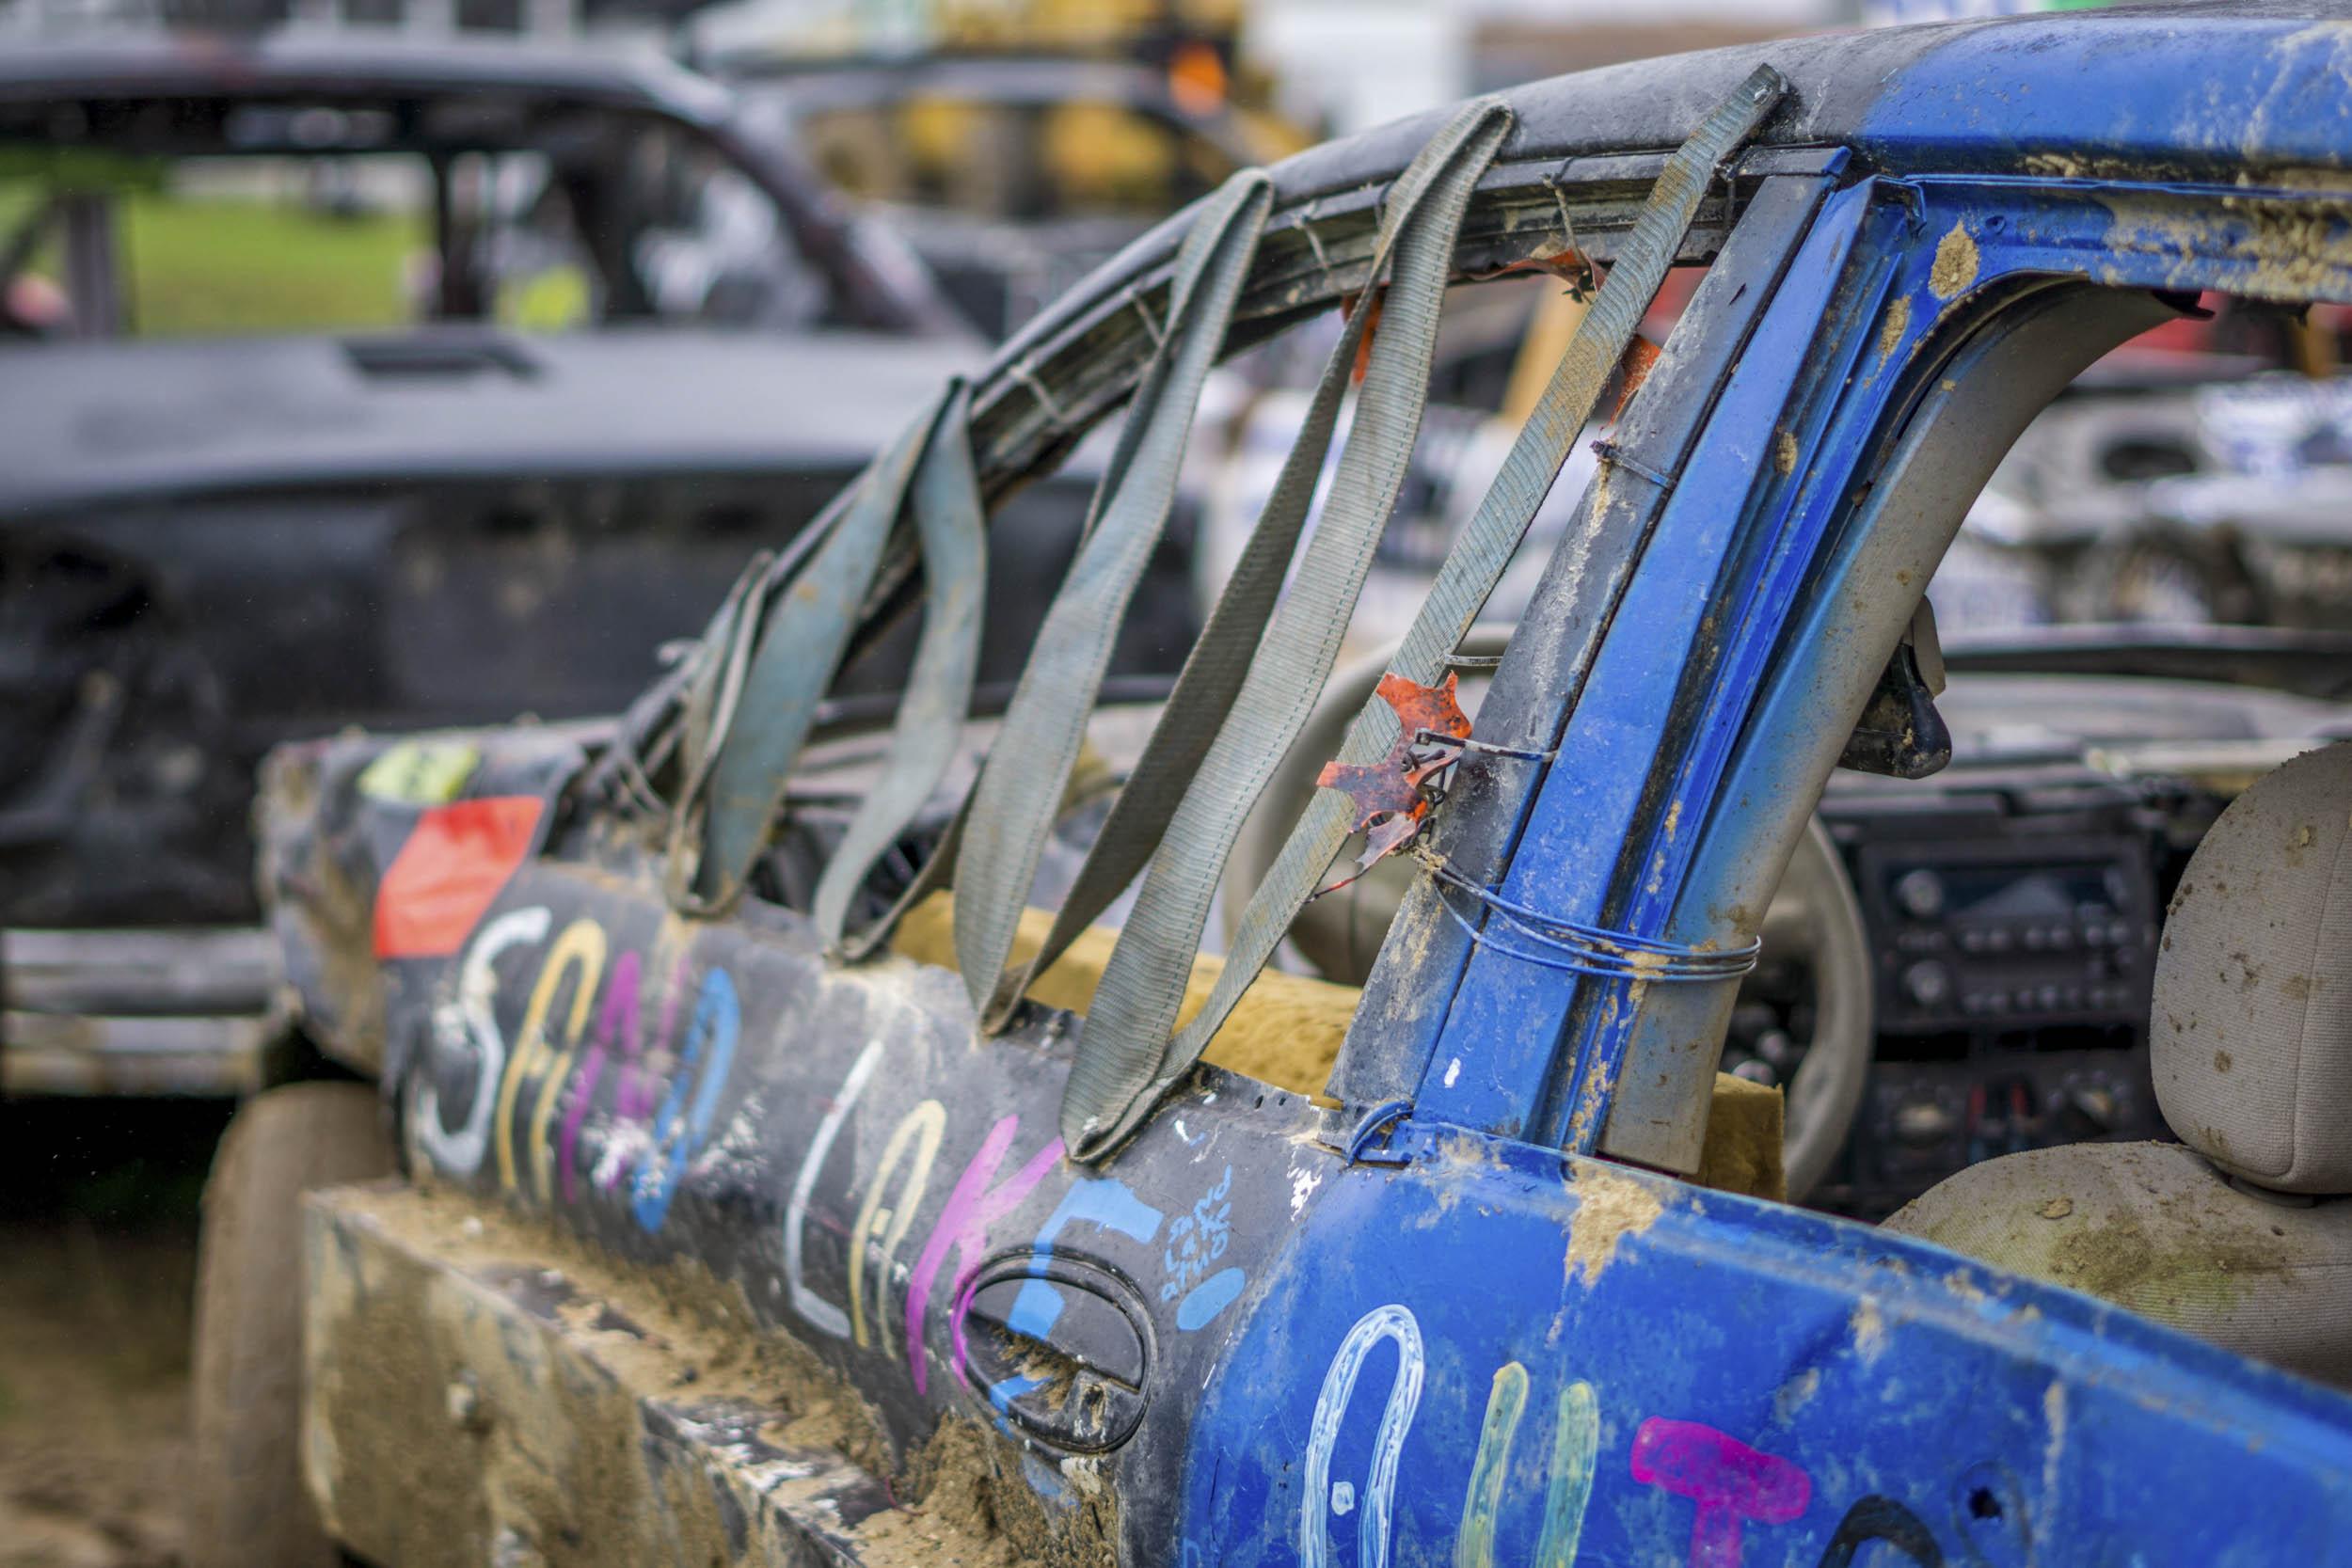 demolition derby duct tape window